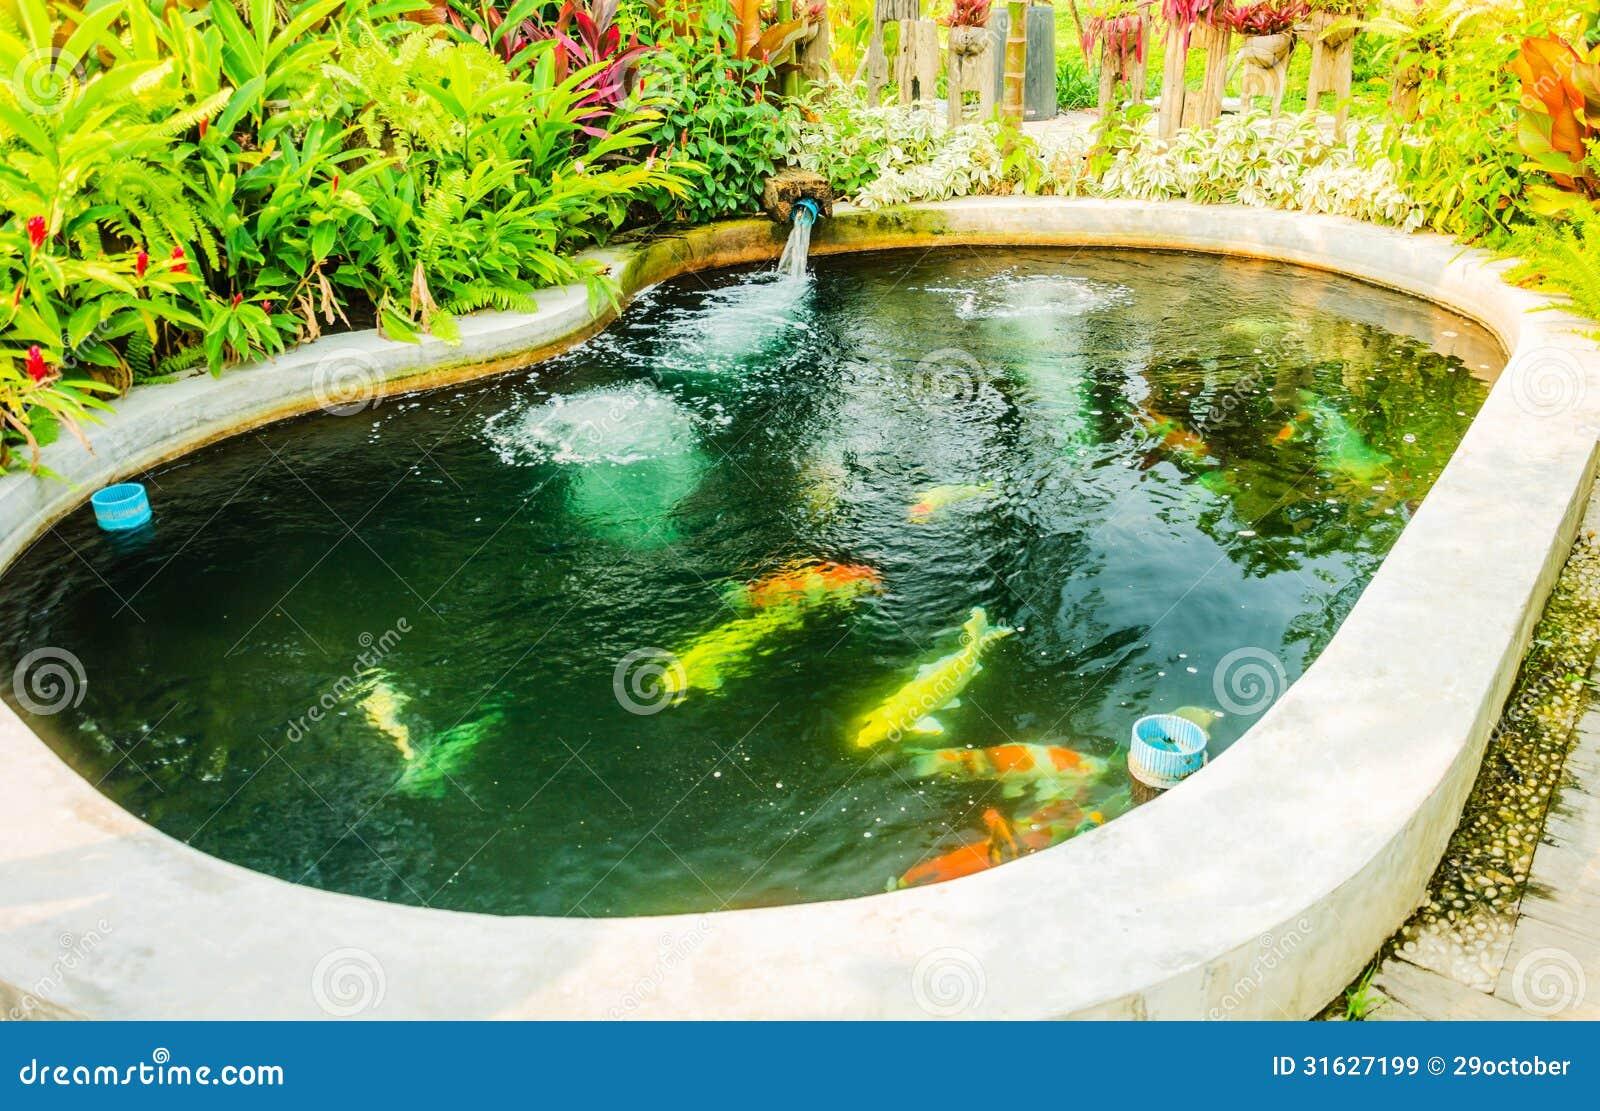 Koi fancy carp cyprinus carpio haematopterus royalty free for Koi carp pool design